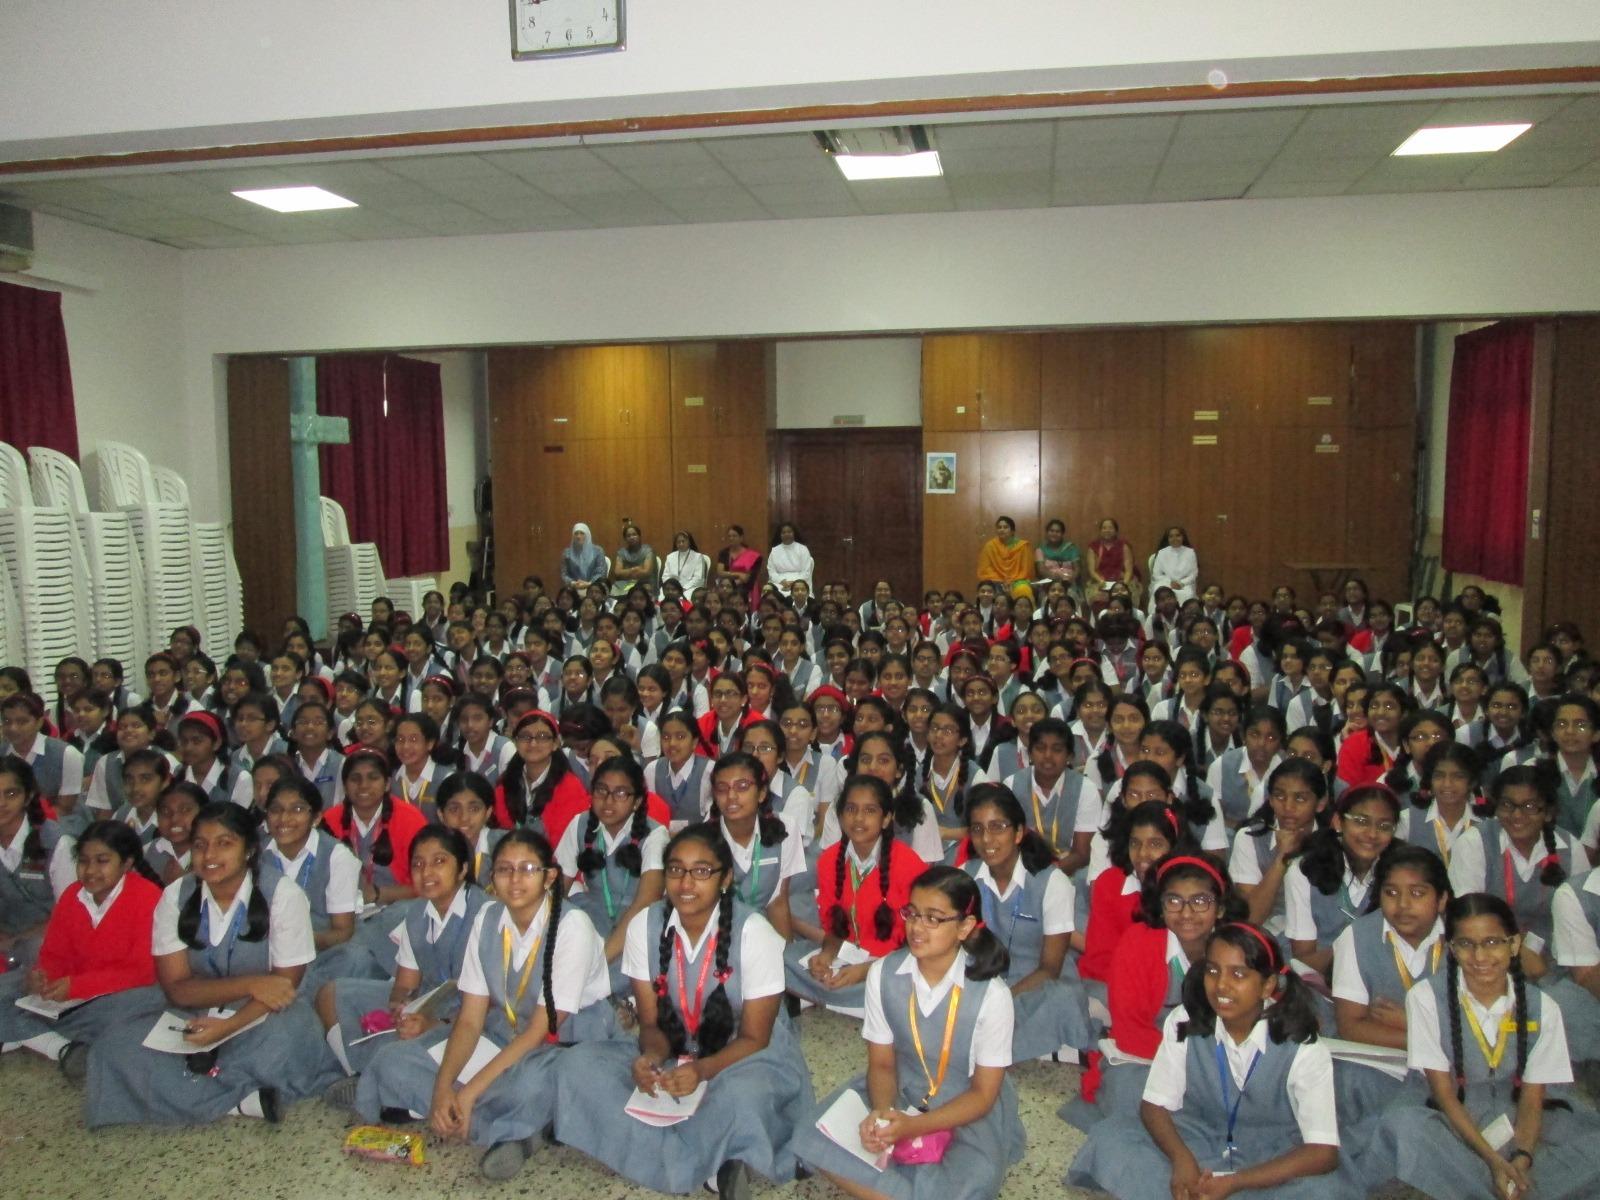 St. Joseph's School Abu Dhabi invites us again